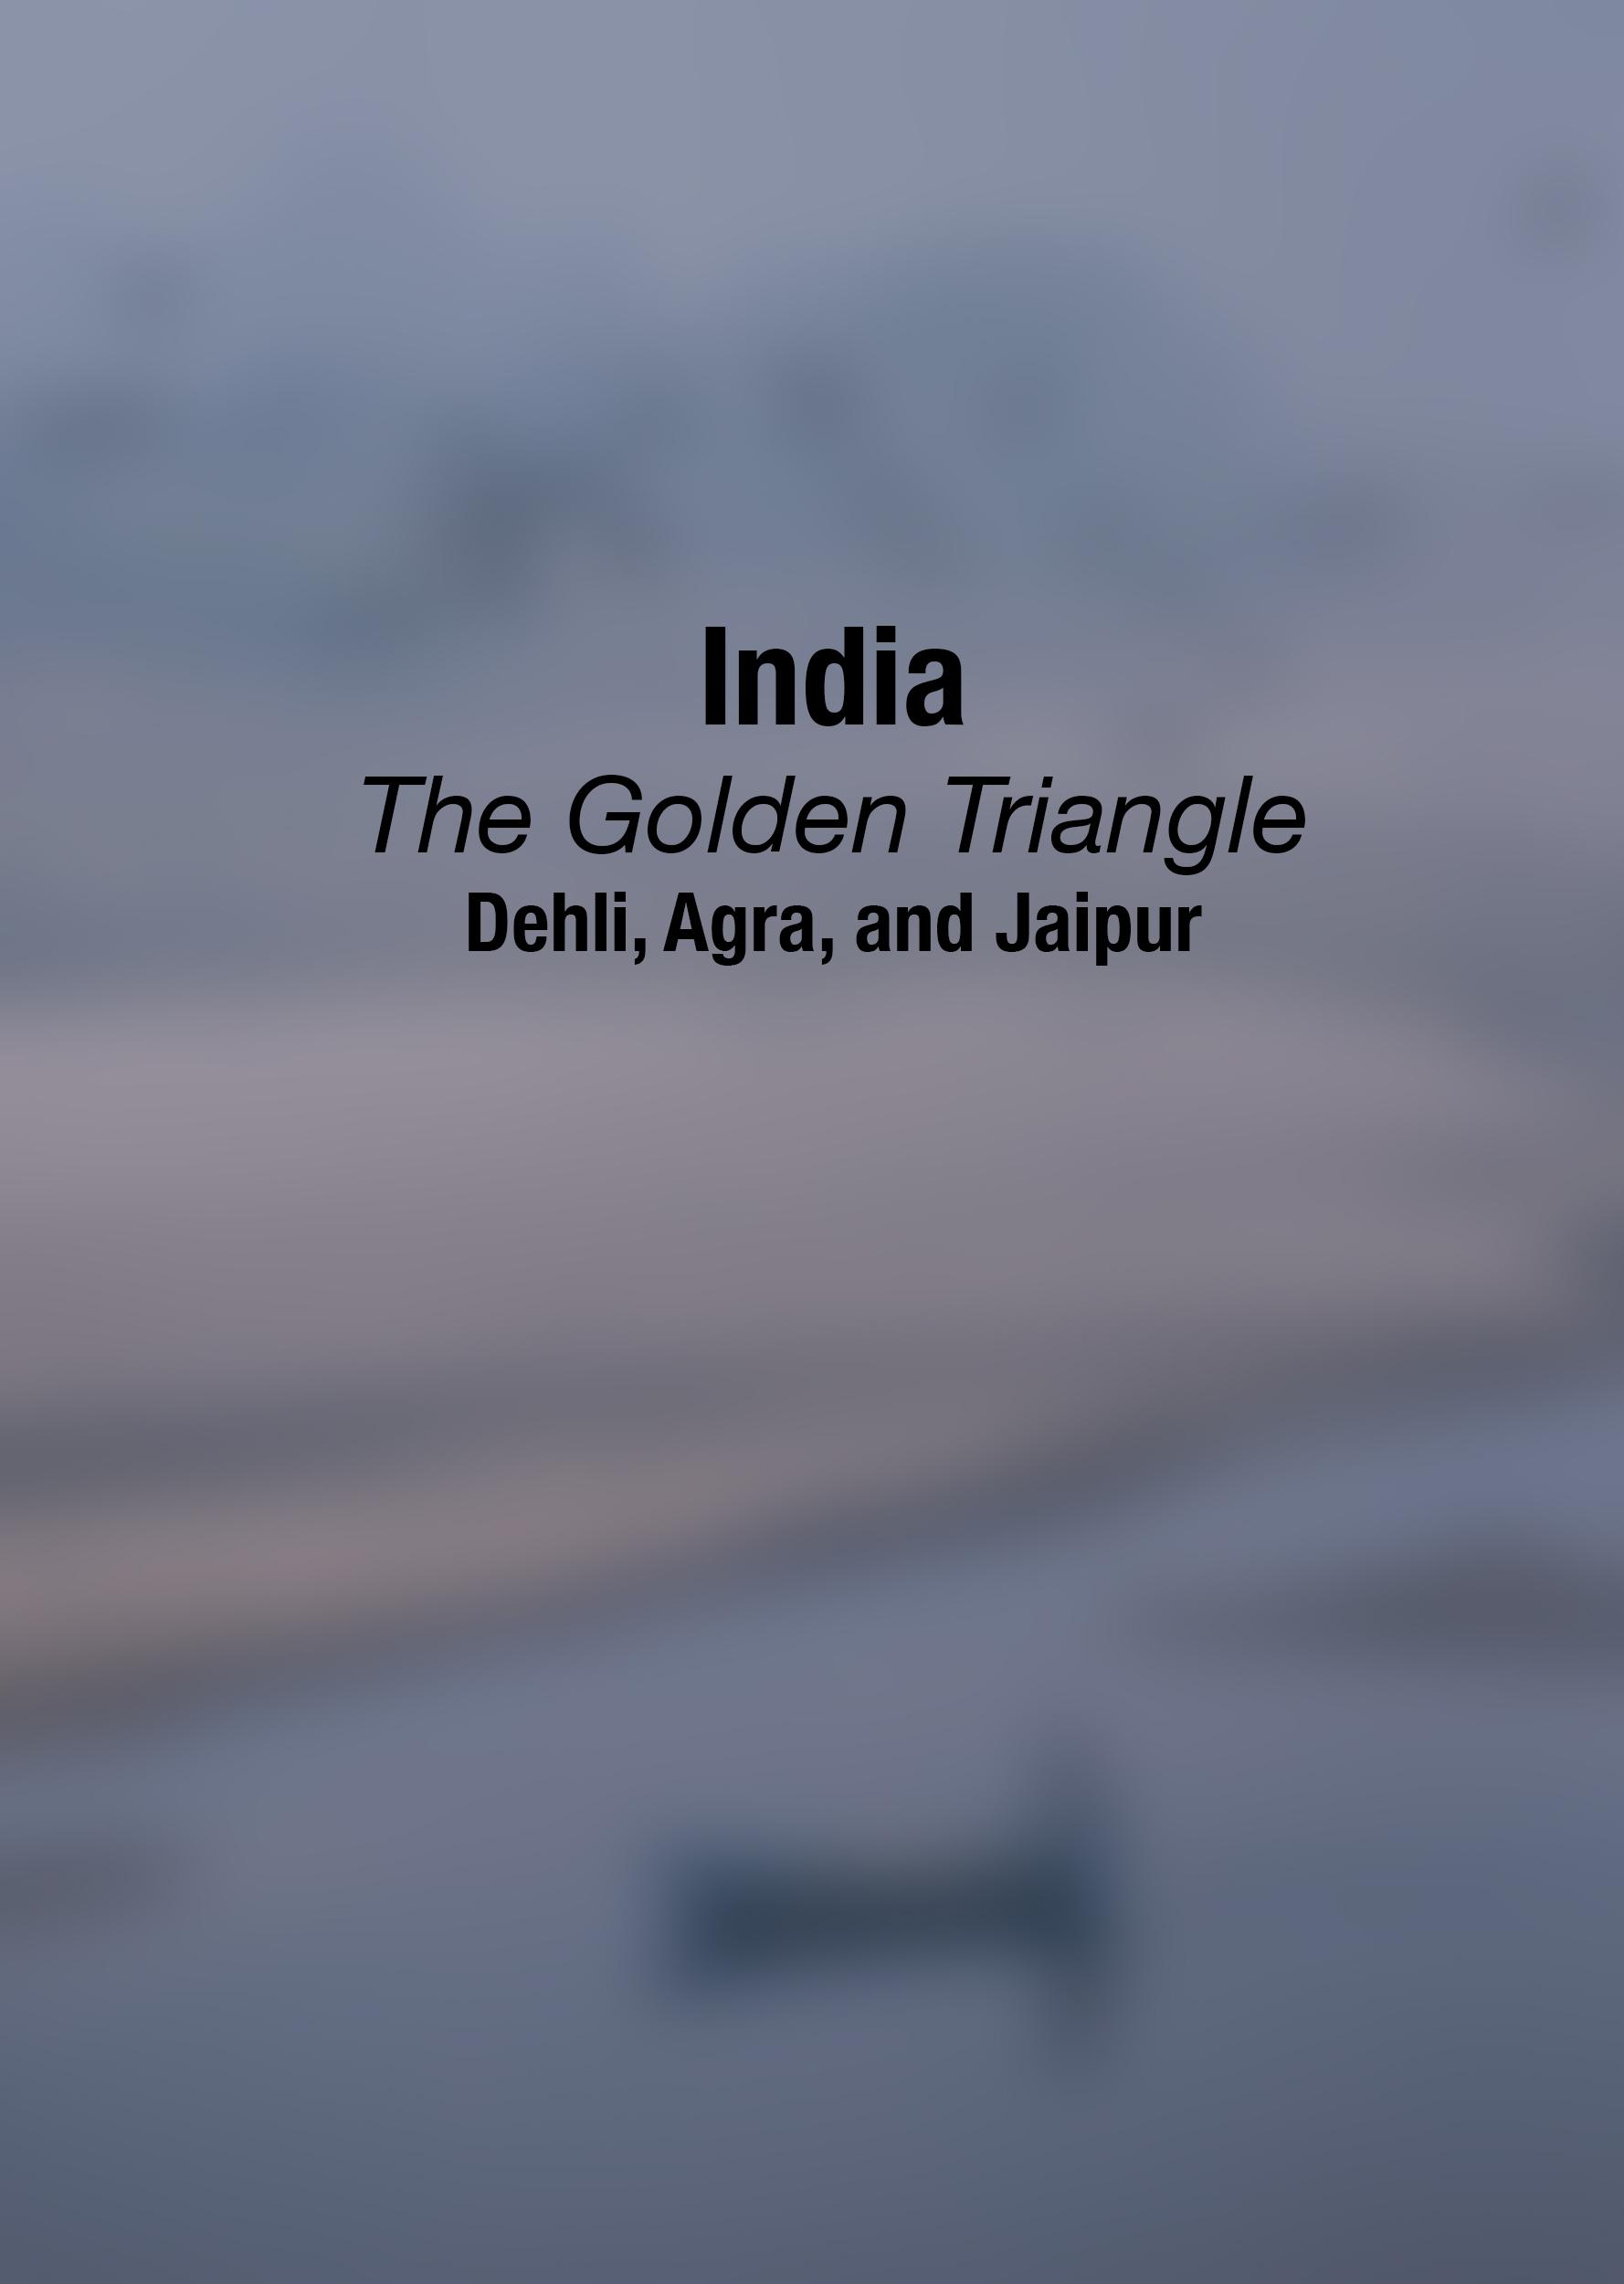 meyer-india-golden_triangle-0.jpg